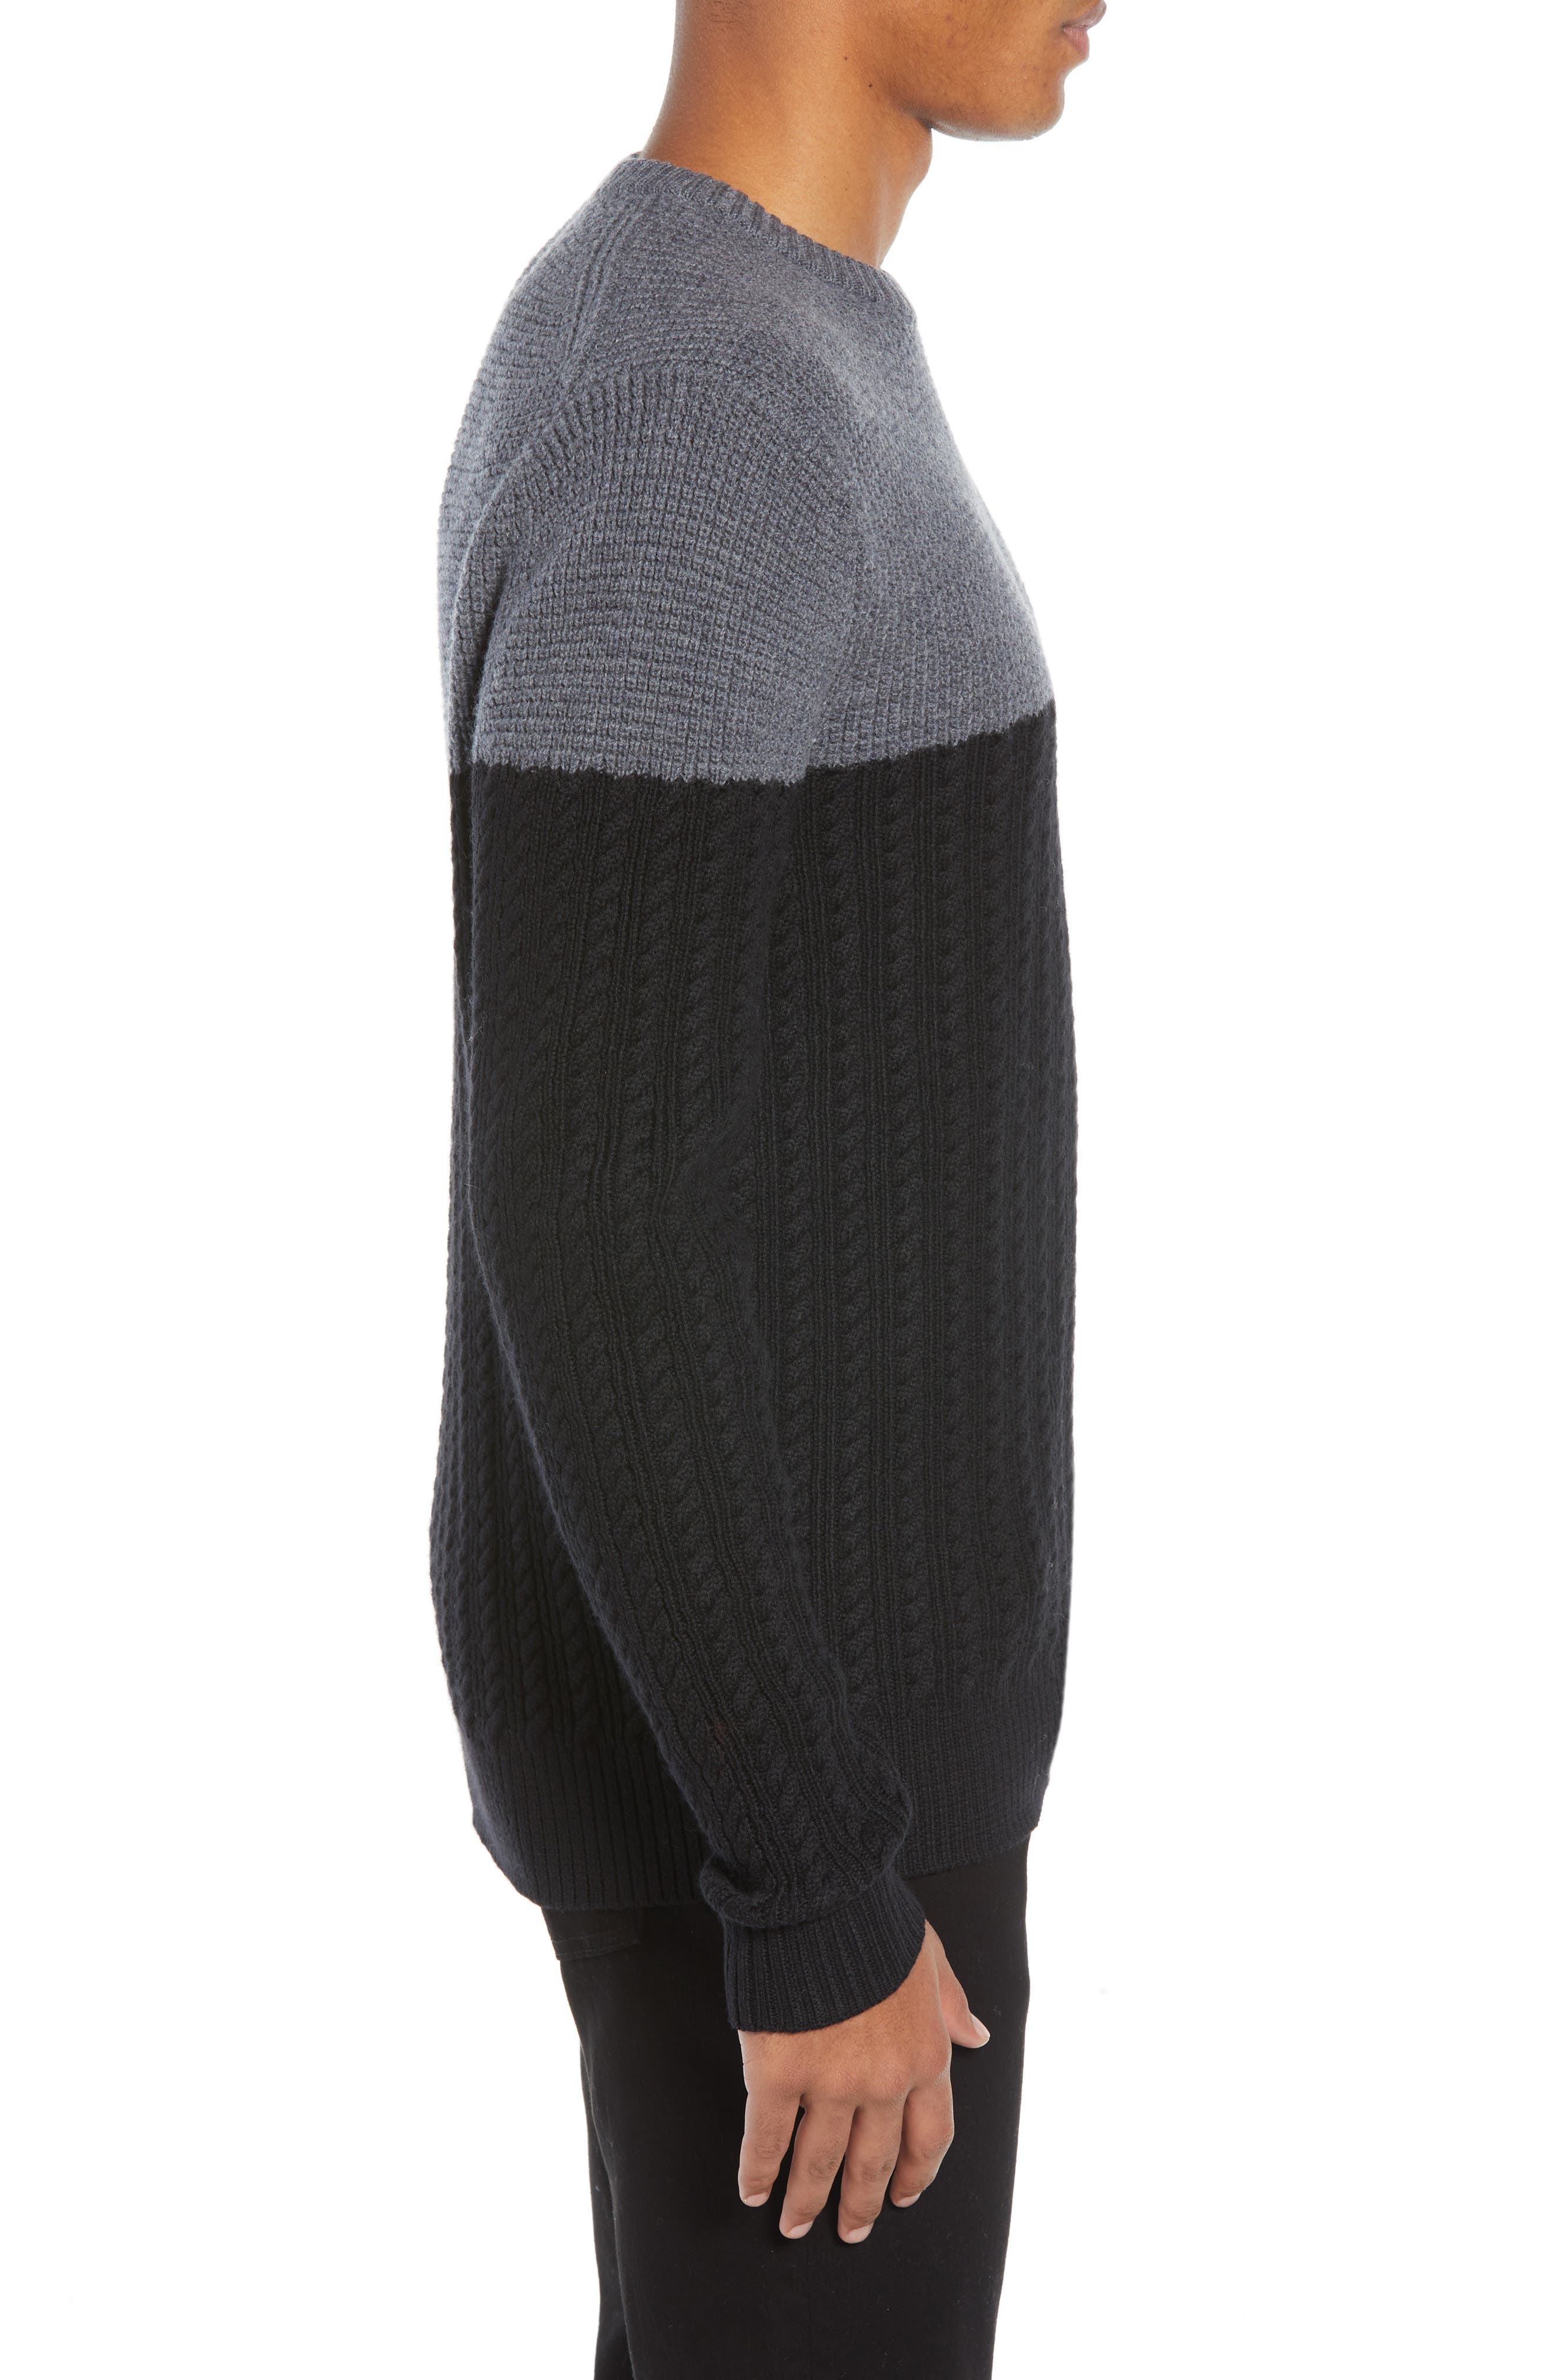 Block Merino Wool Cable Knit Sweater,                             Alternate thumbnail 3, color,                             BLACK CAVIAR COLORBLOCK